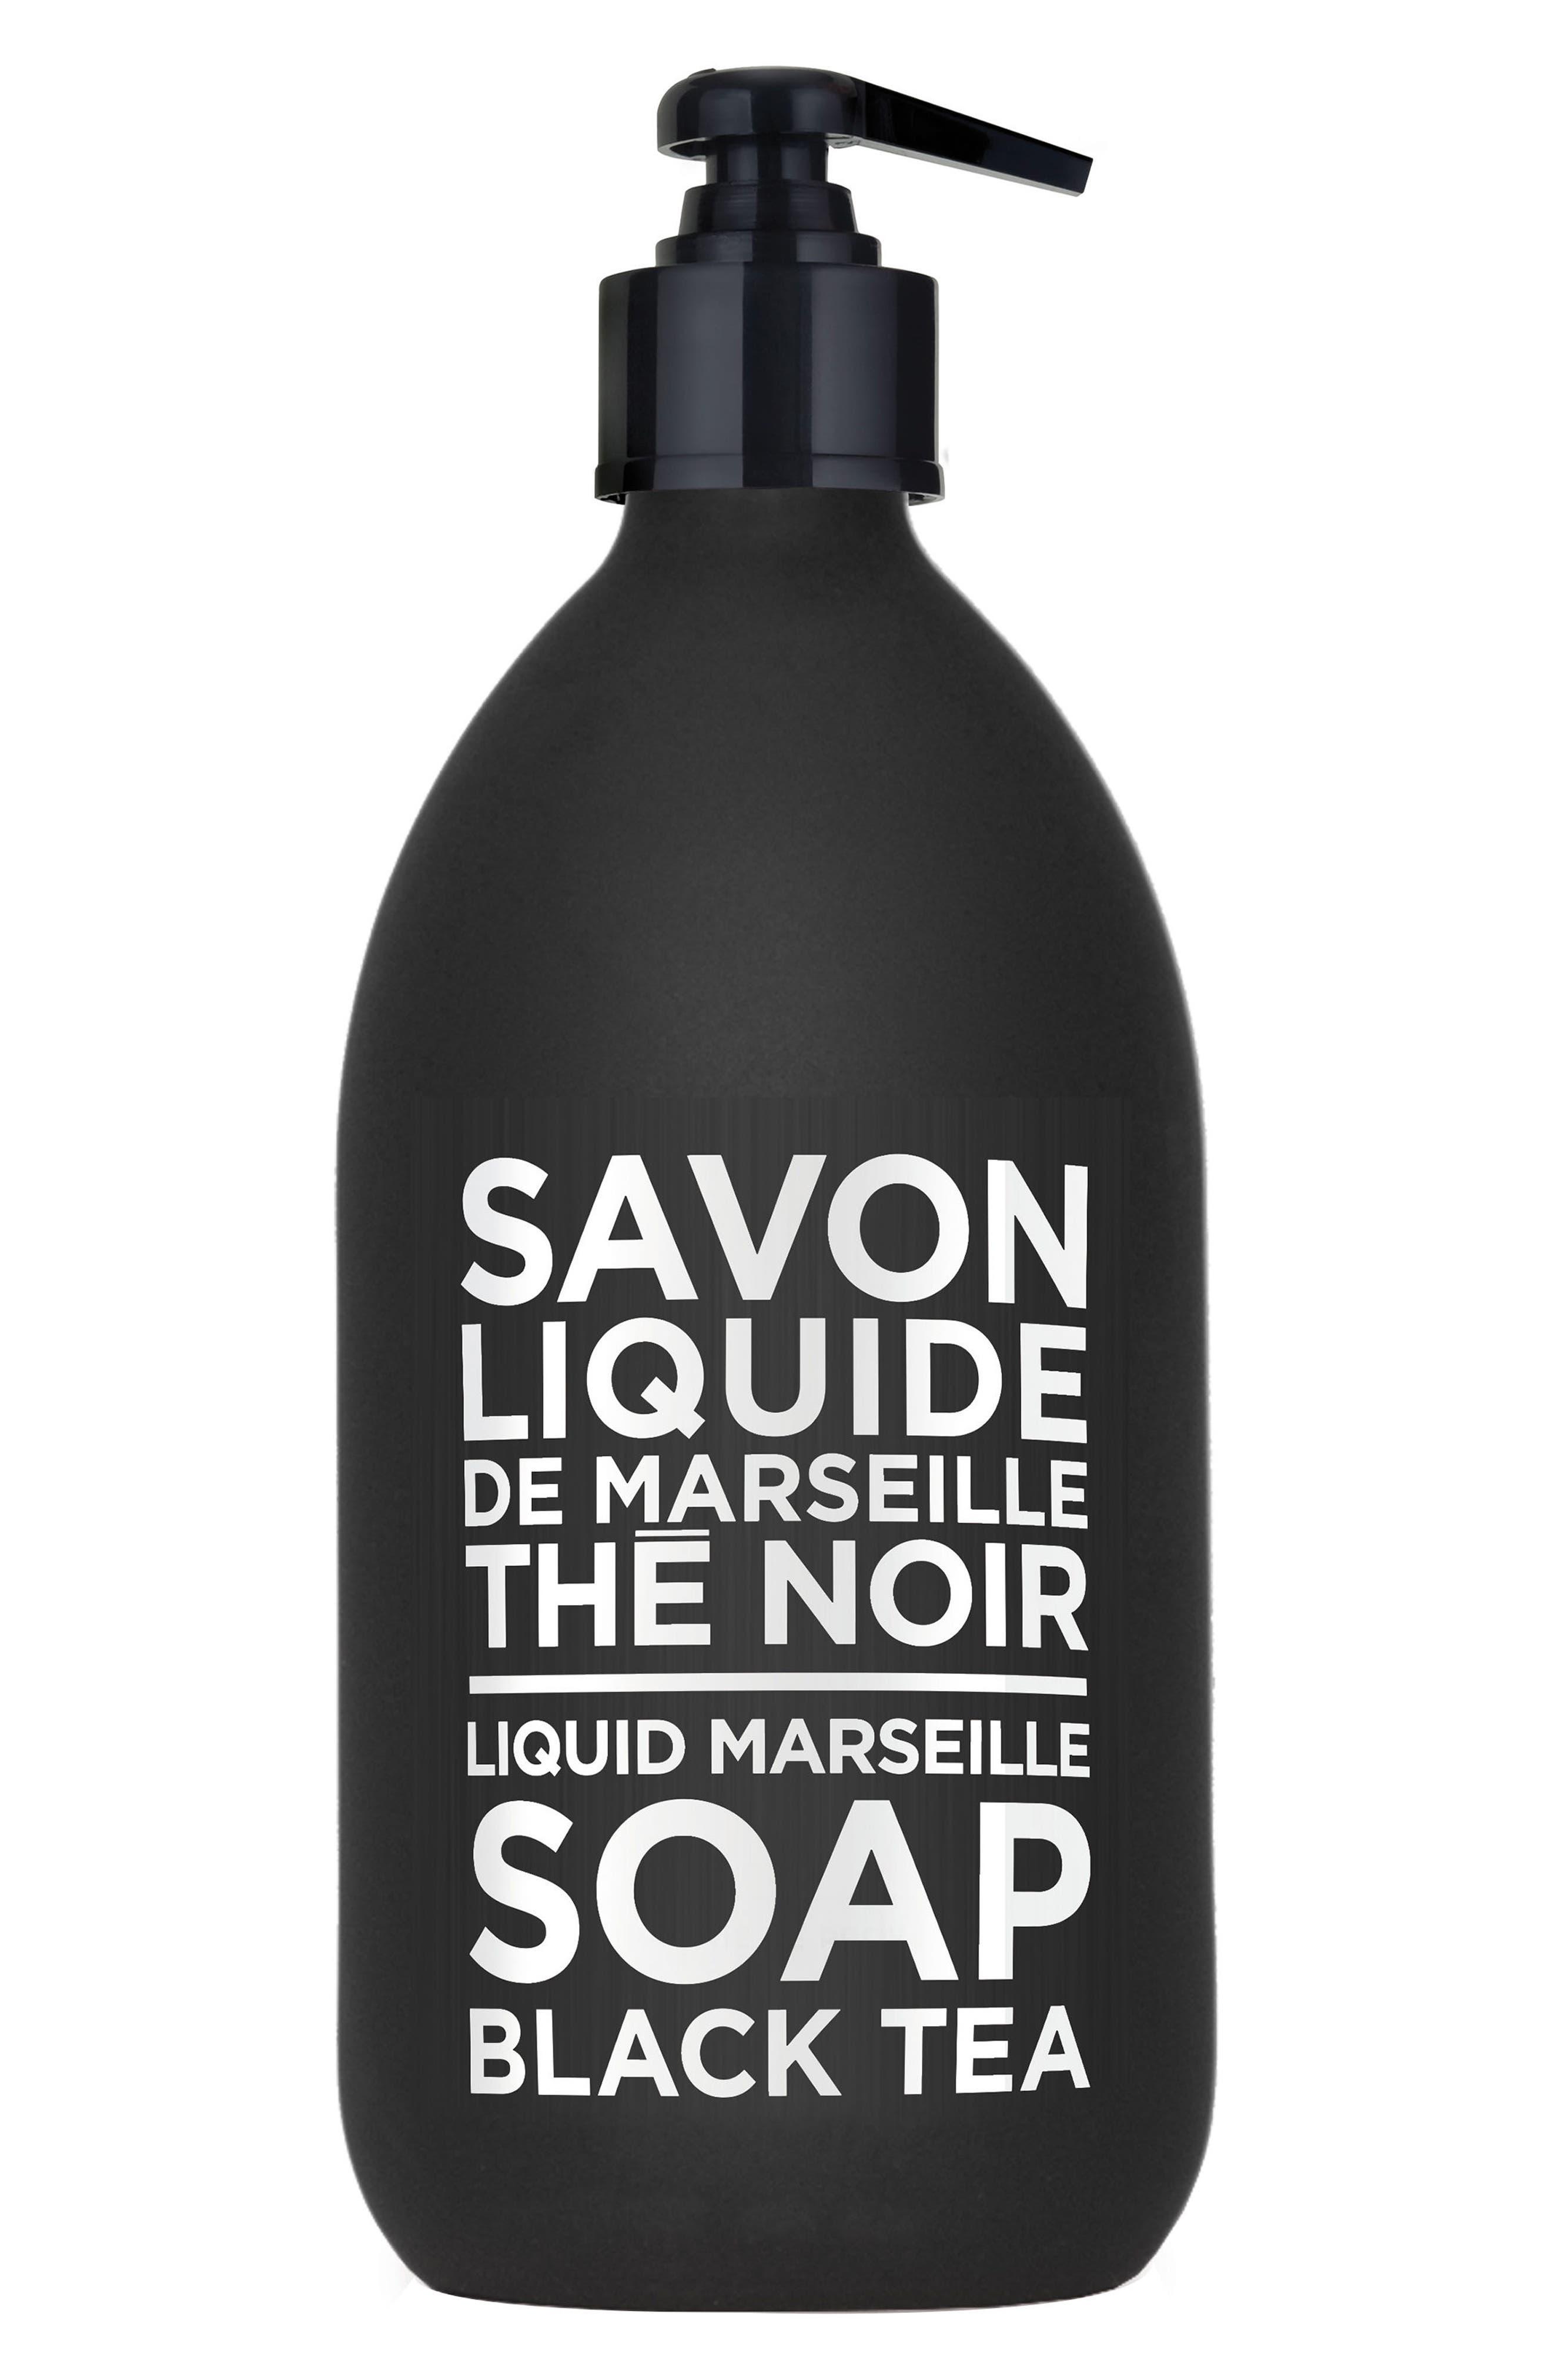 Black Tea Liquid Marseille Soap,                         Main,                         color, No Color